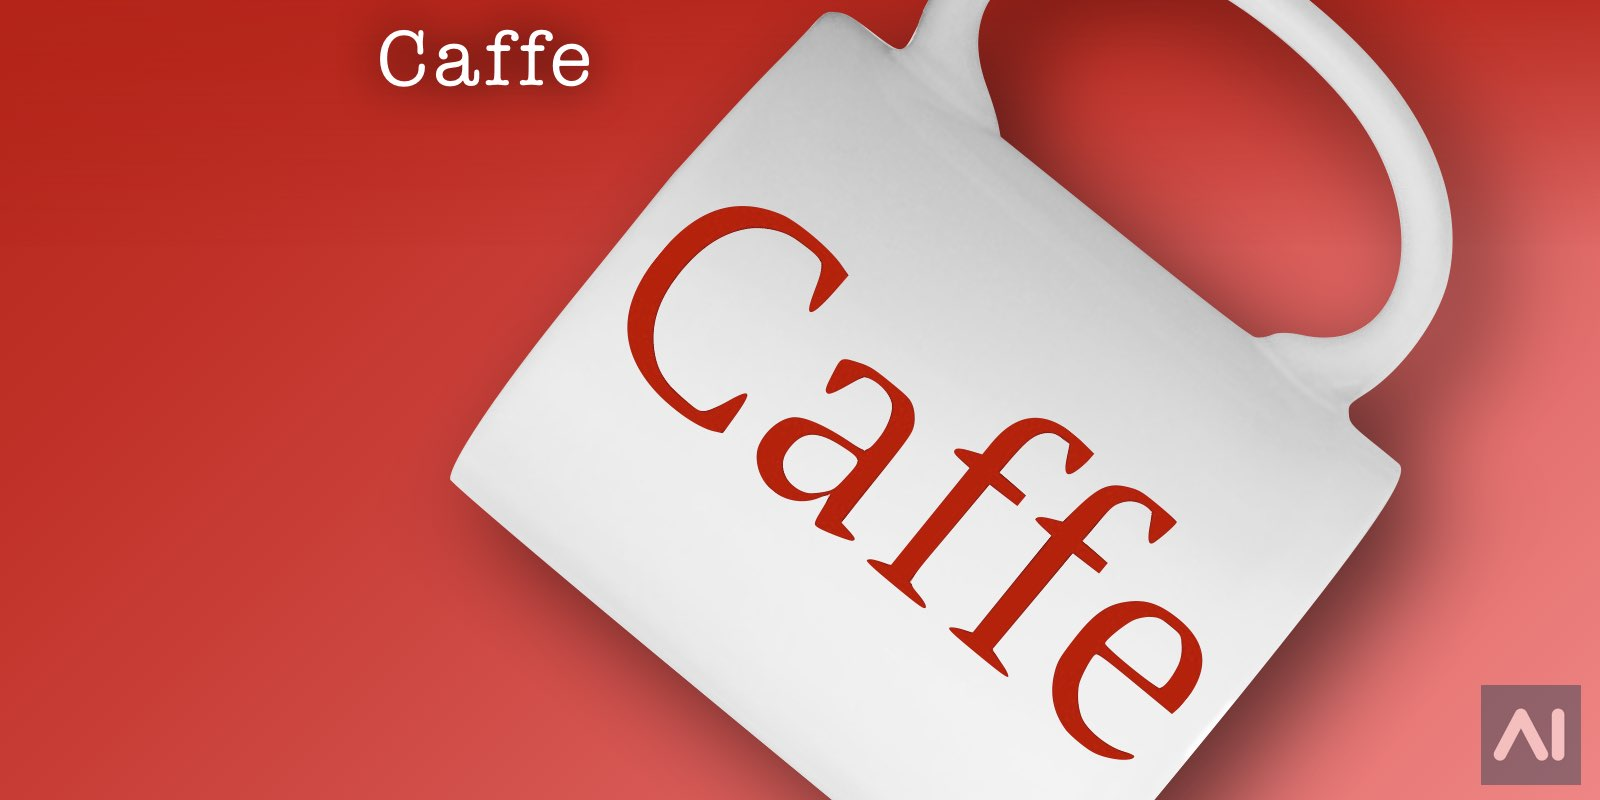 caffeenew.jpeg